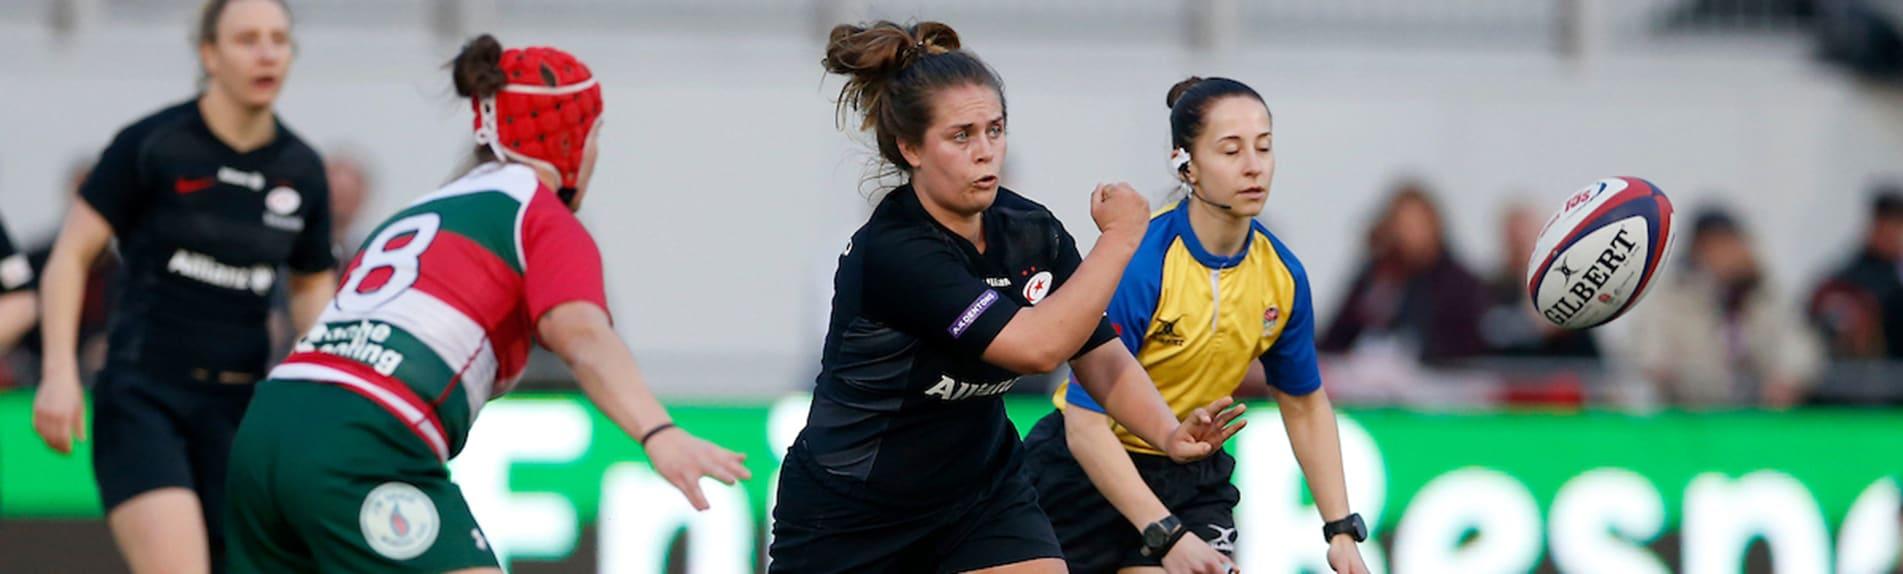 Saracens Women v Firwood Waterloo LadiesTyrrells Premier 15s